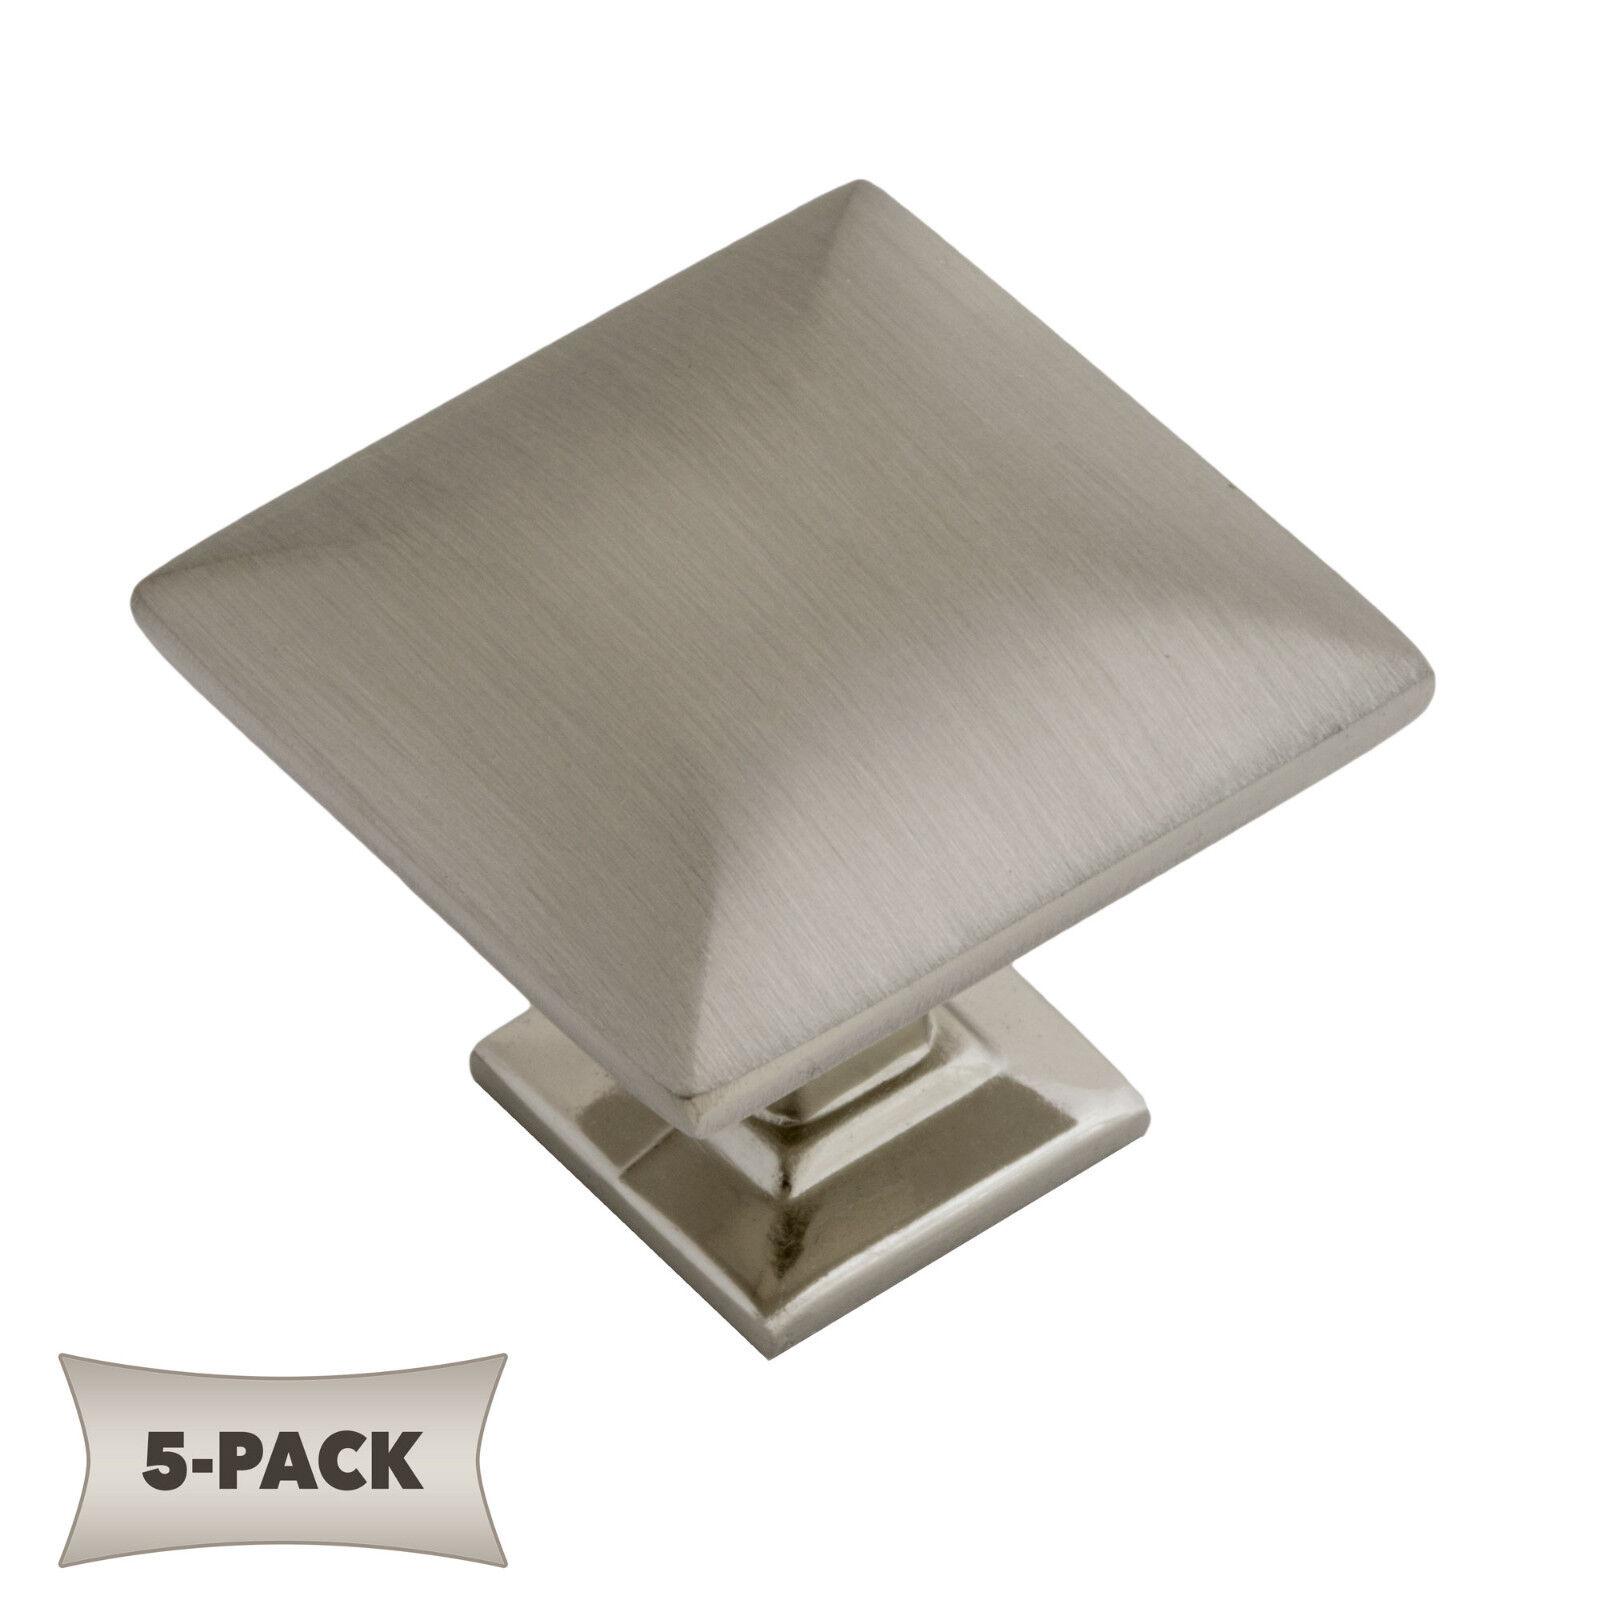 Modern Pyramid Square Kitchen Cabinet Hardware Knob 1 1 4 Satin Nickel